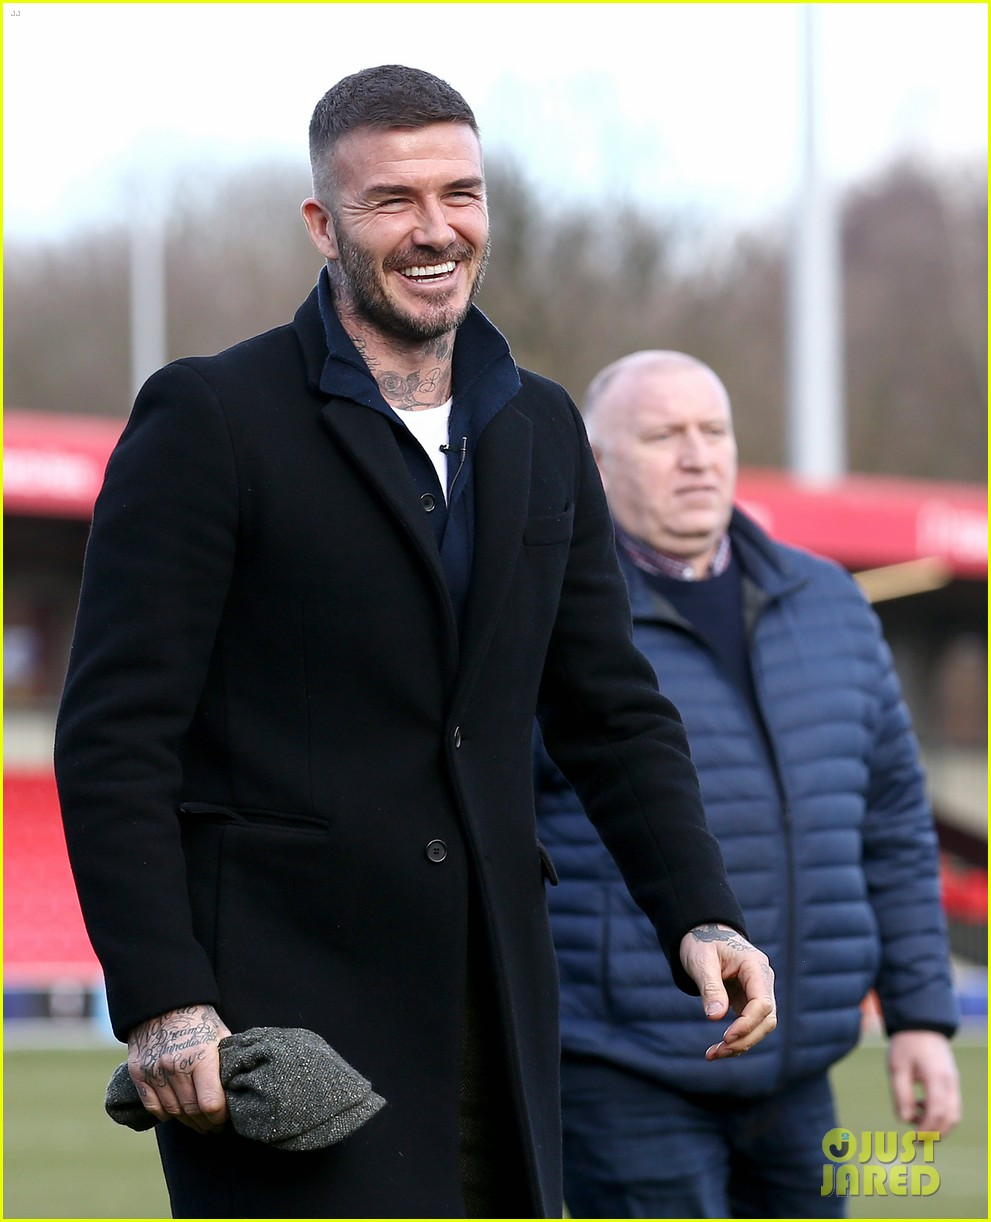 david beckham attends salford city game 01